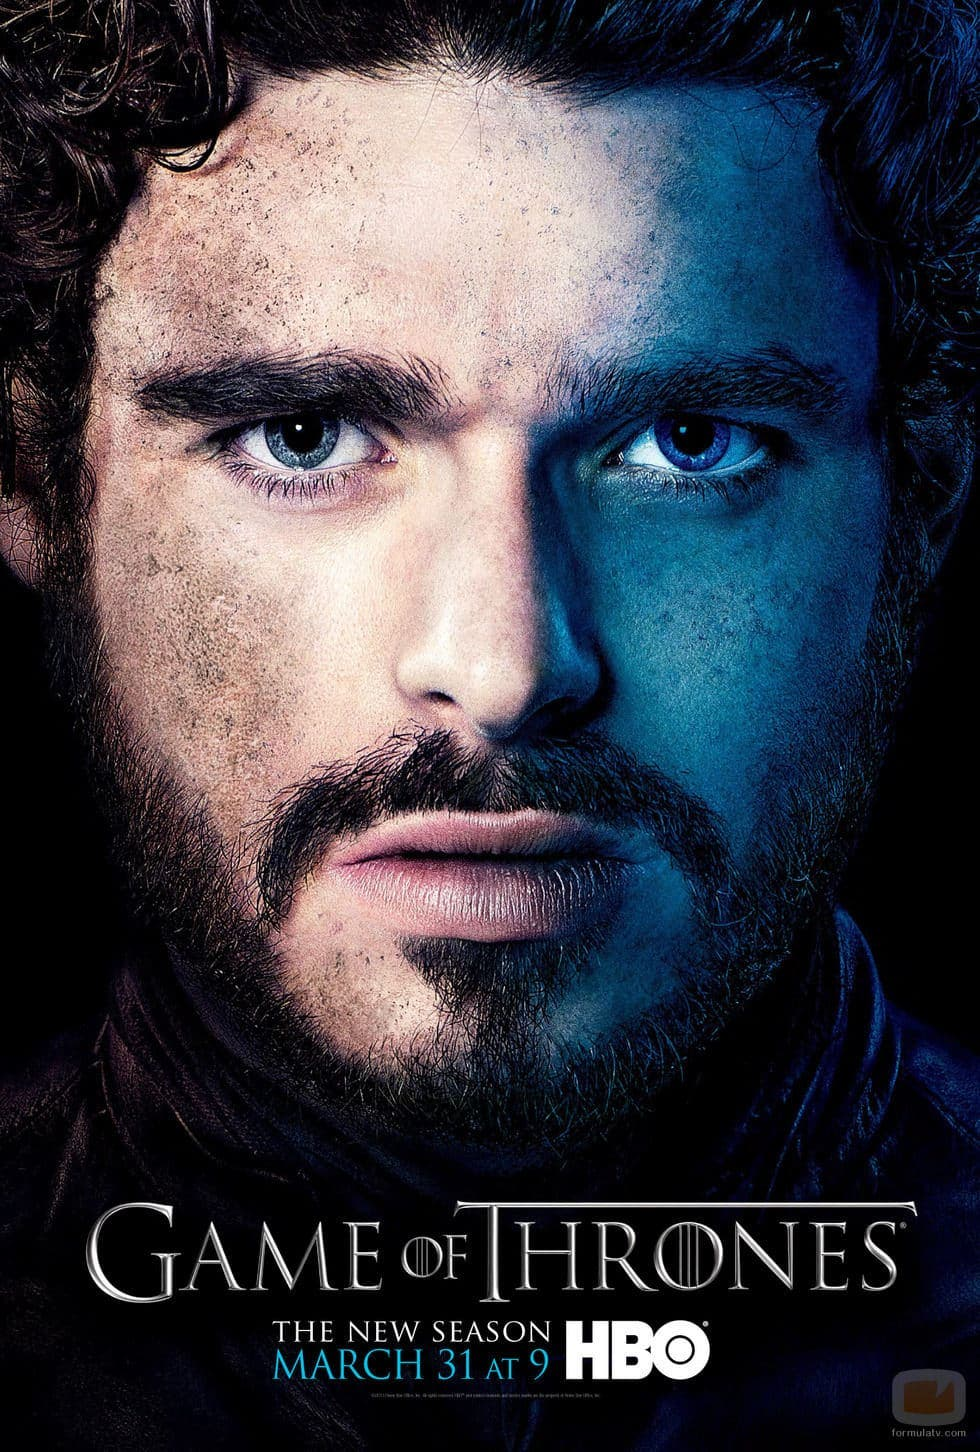 robb-stark-poster-promocional-tercera-temporada-juego-de-tronos